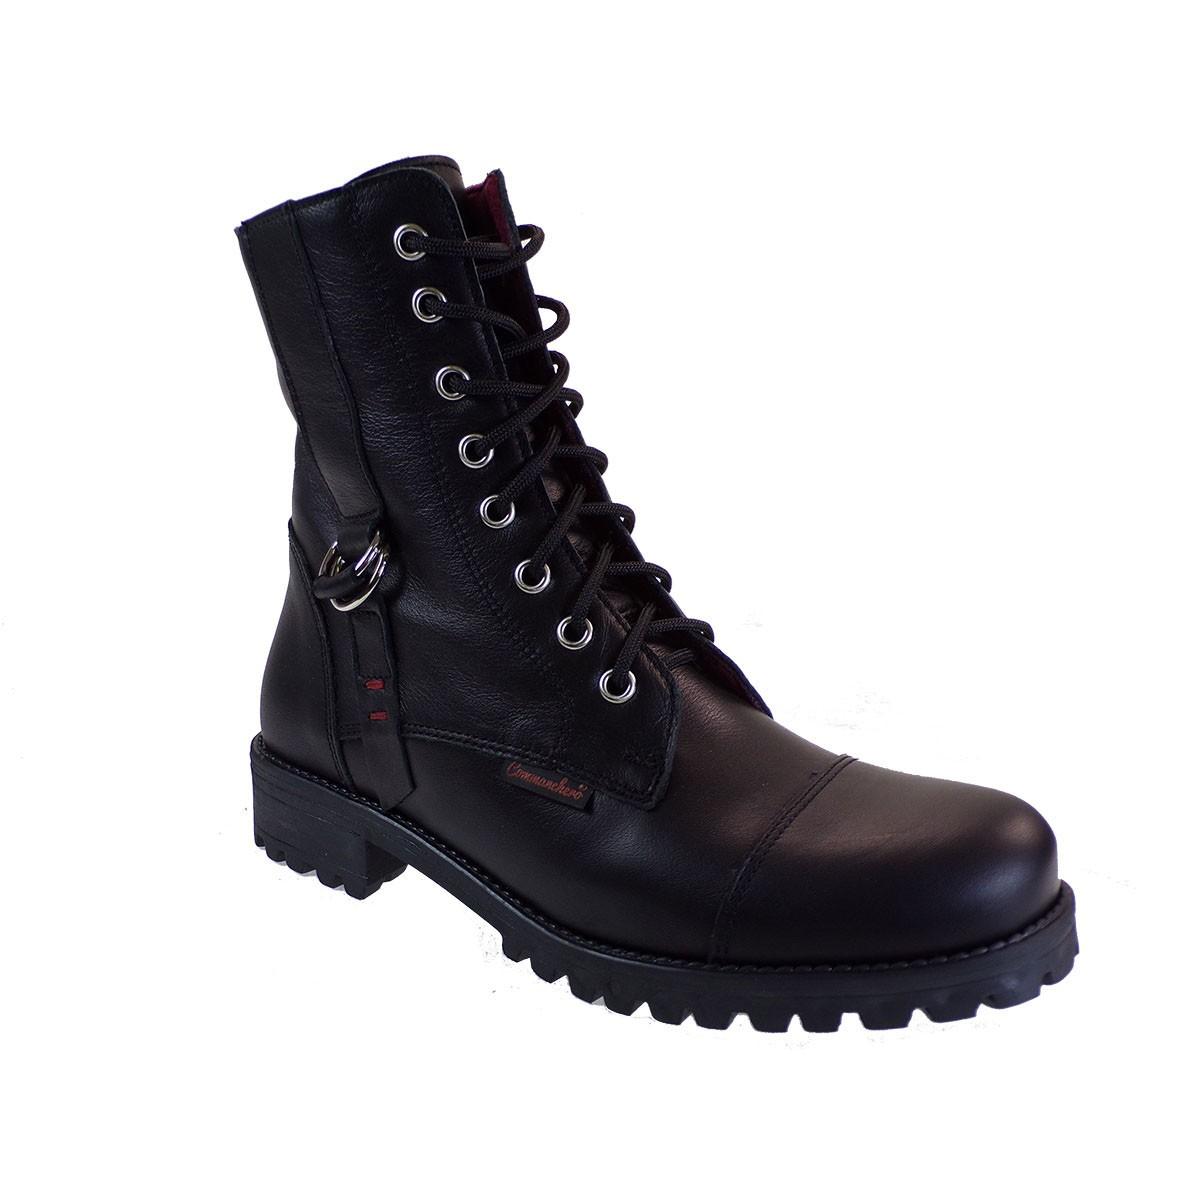 Commanchero Γυναικεία Παπούτσια Μποτάκια Αρβυλάκια 5280-721 Μαύρο Δέρμα